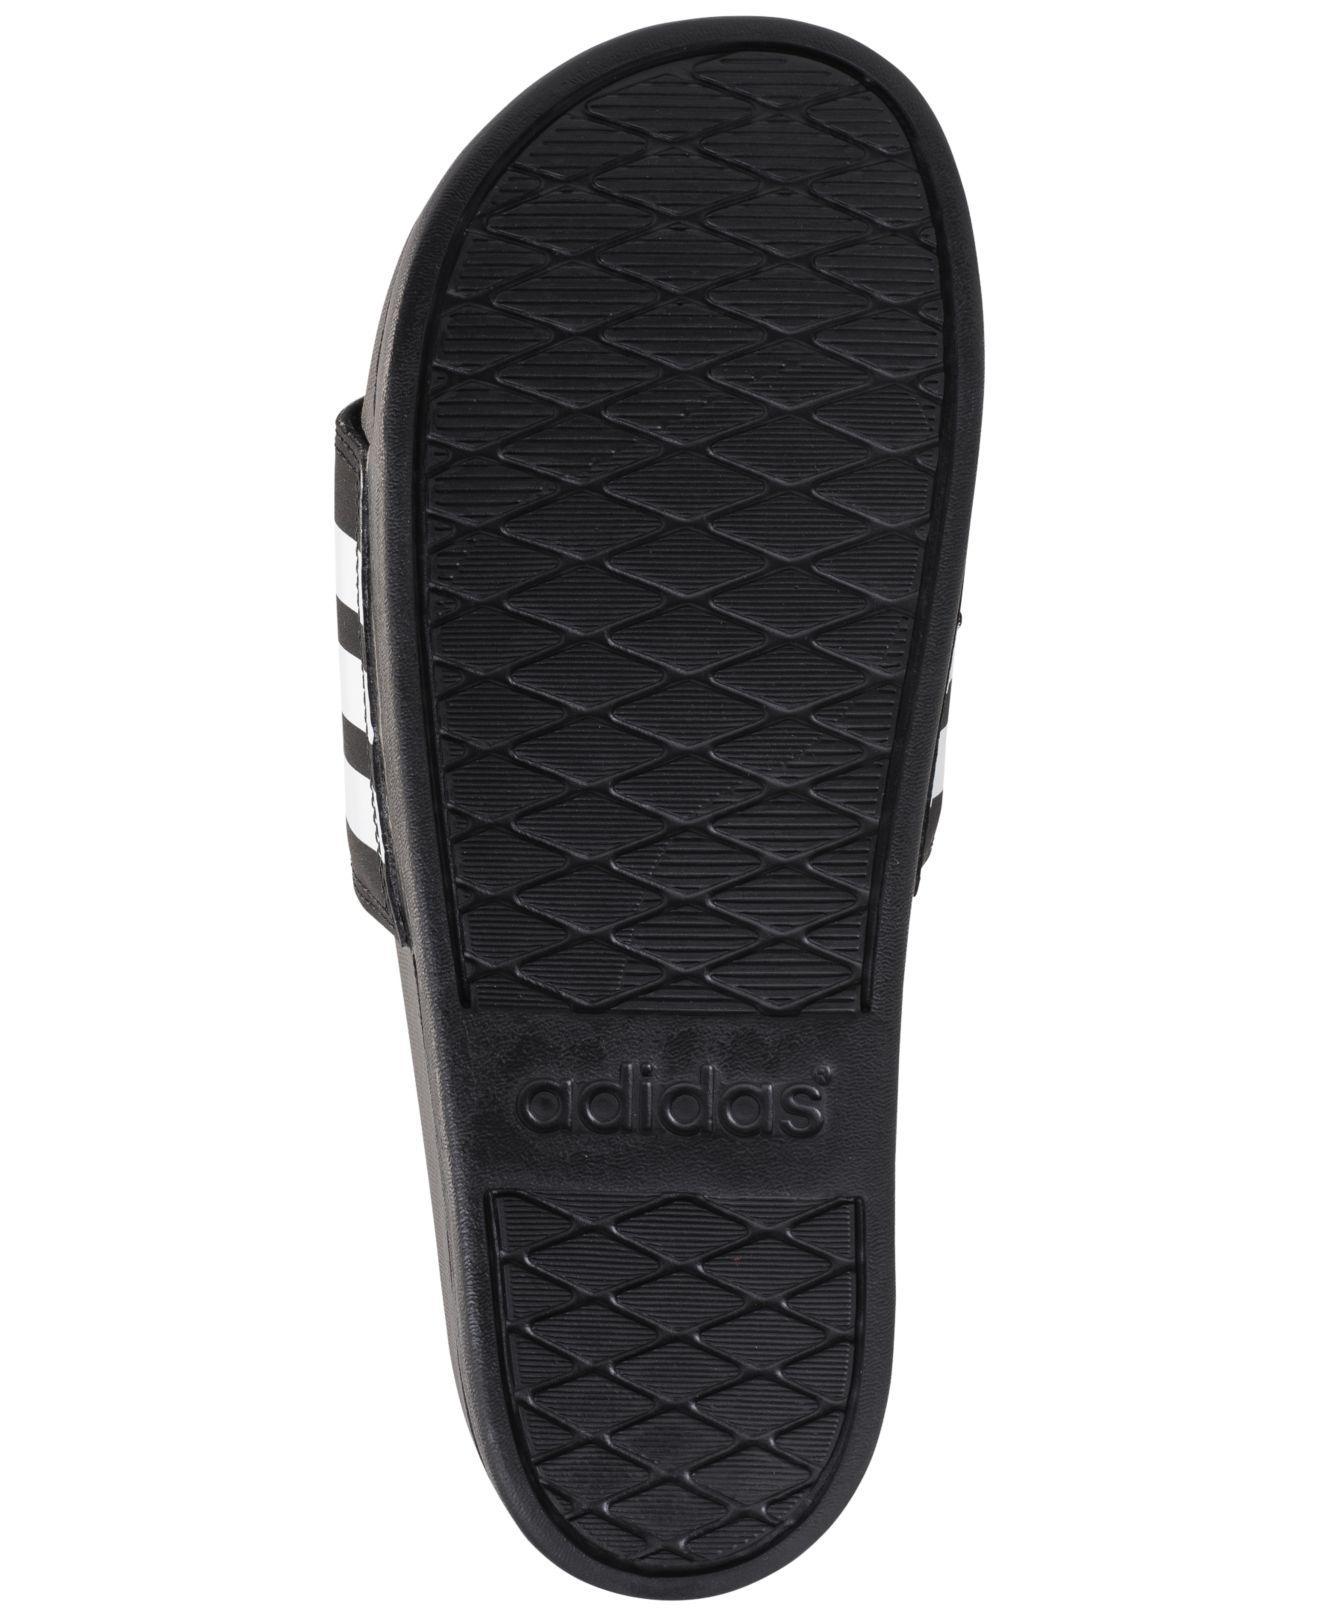 save off 3cc8f e35e0 Adidas - Adilette Cloudfoam Ultra Stripes (black white black) Women s Slide  Shoes. View fullscreen